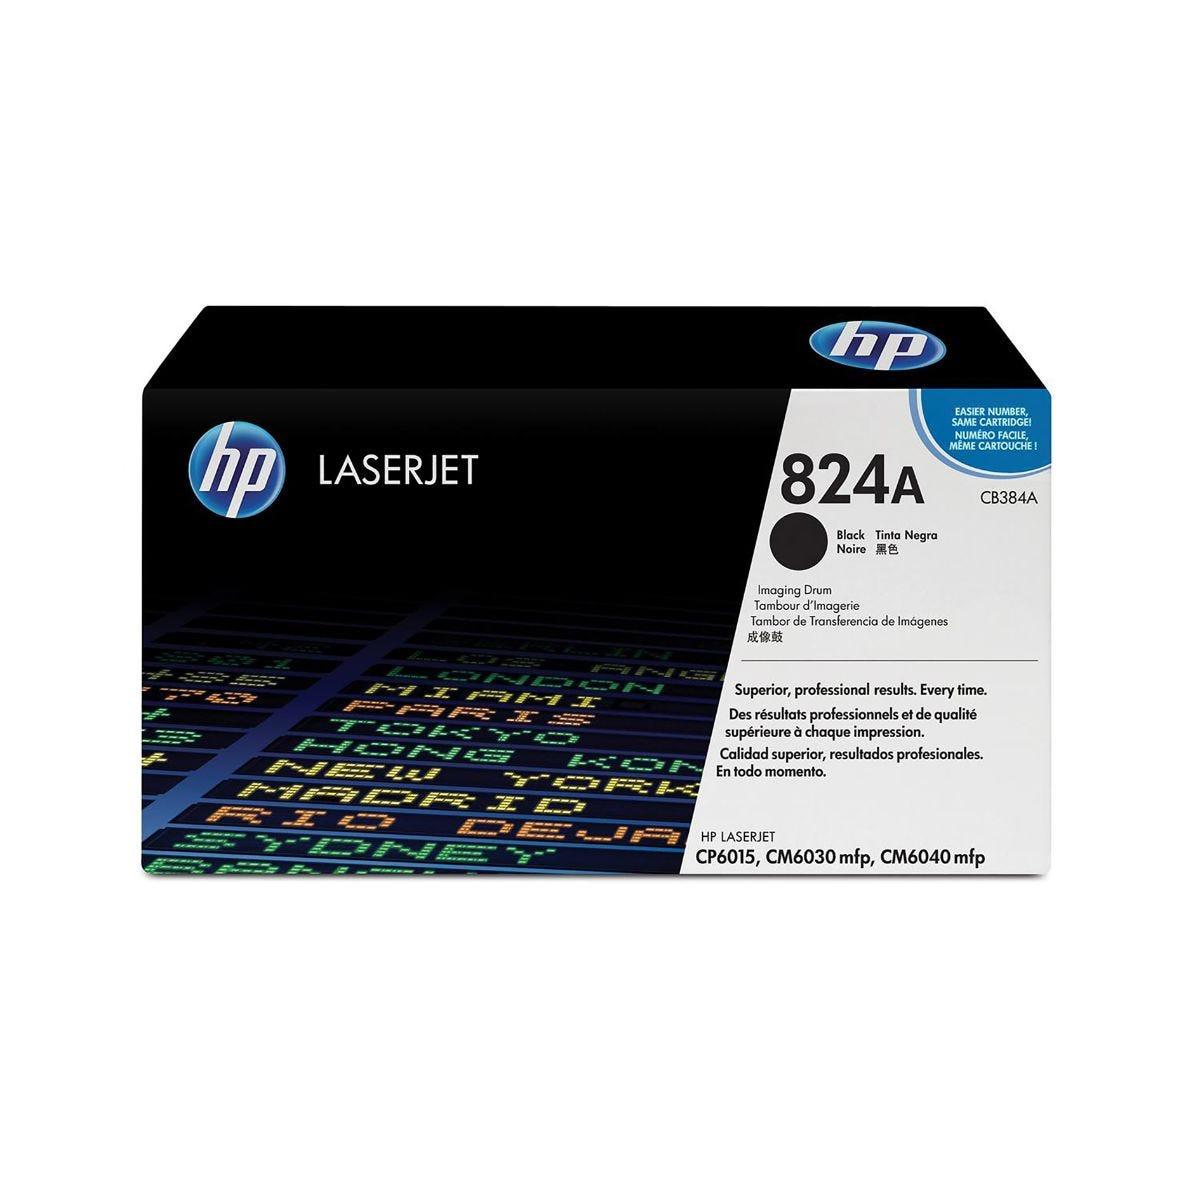 HP 824A Image Drum Black, Black